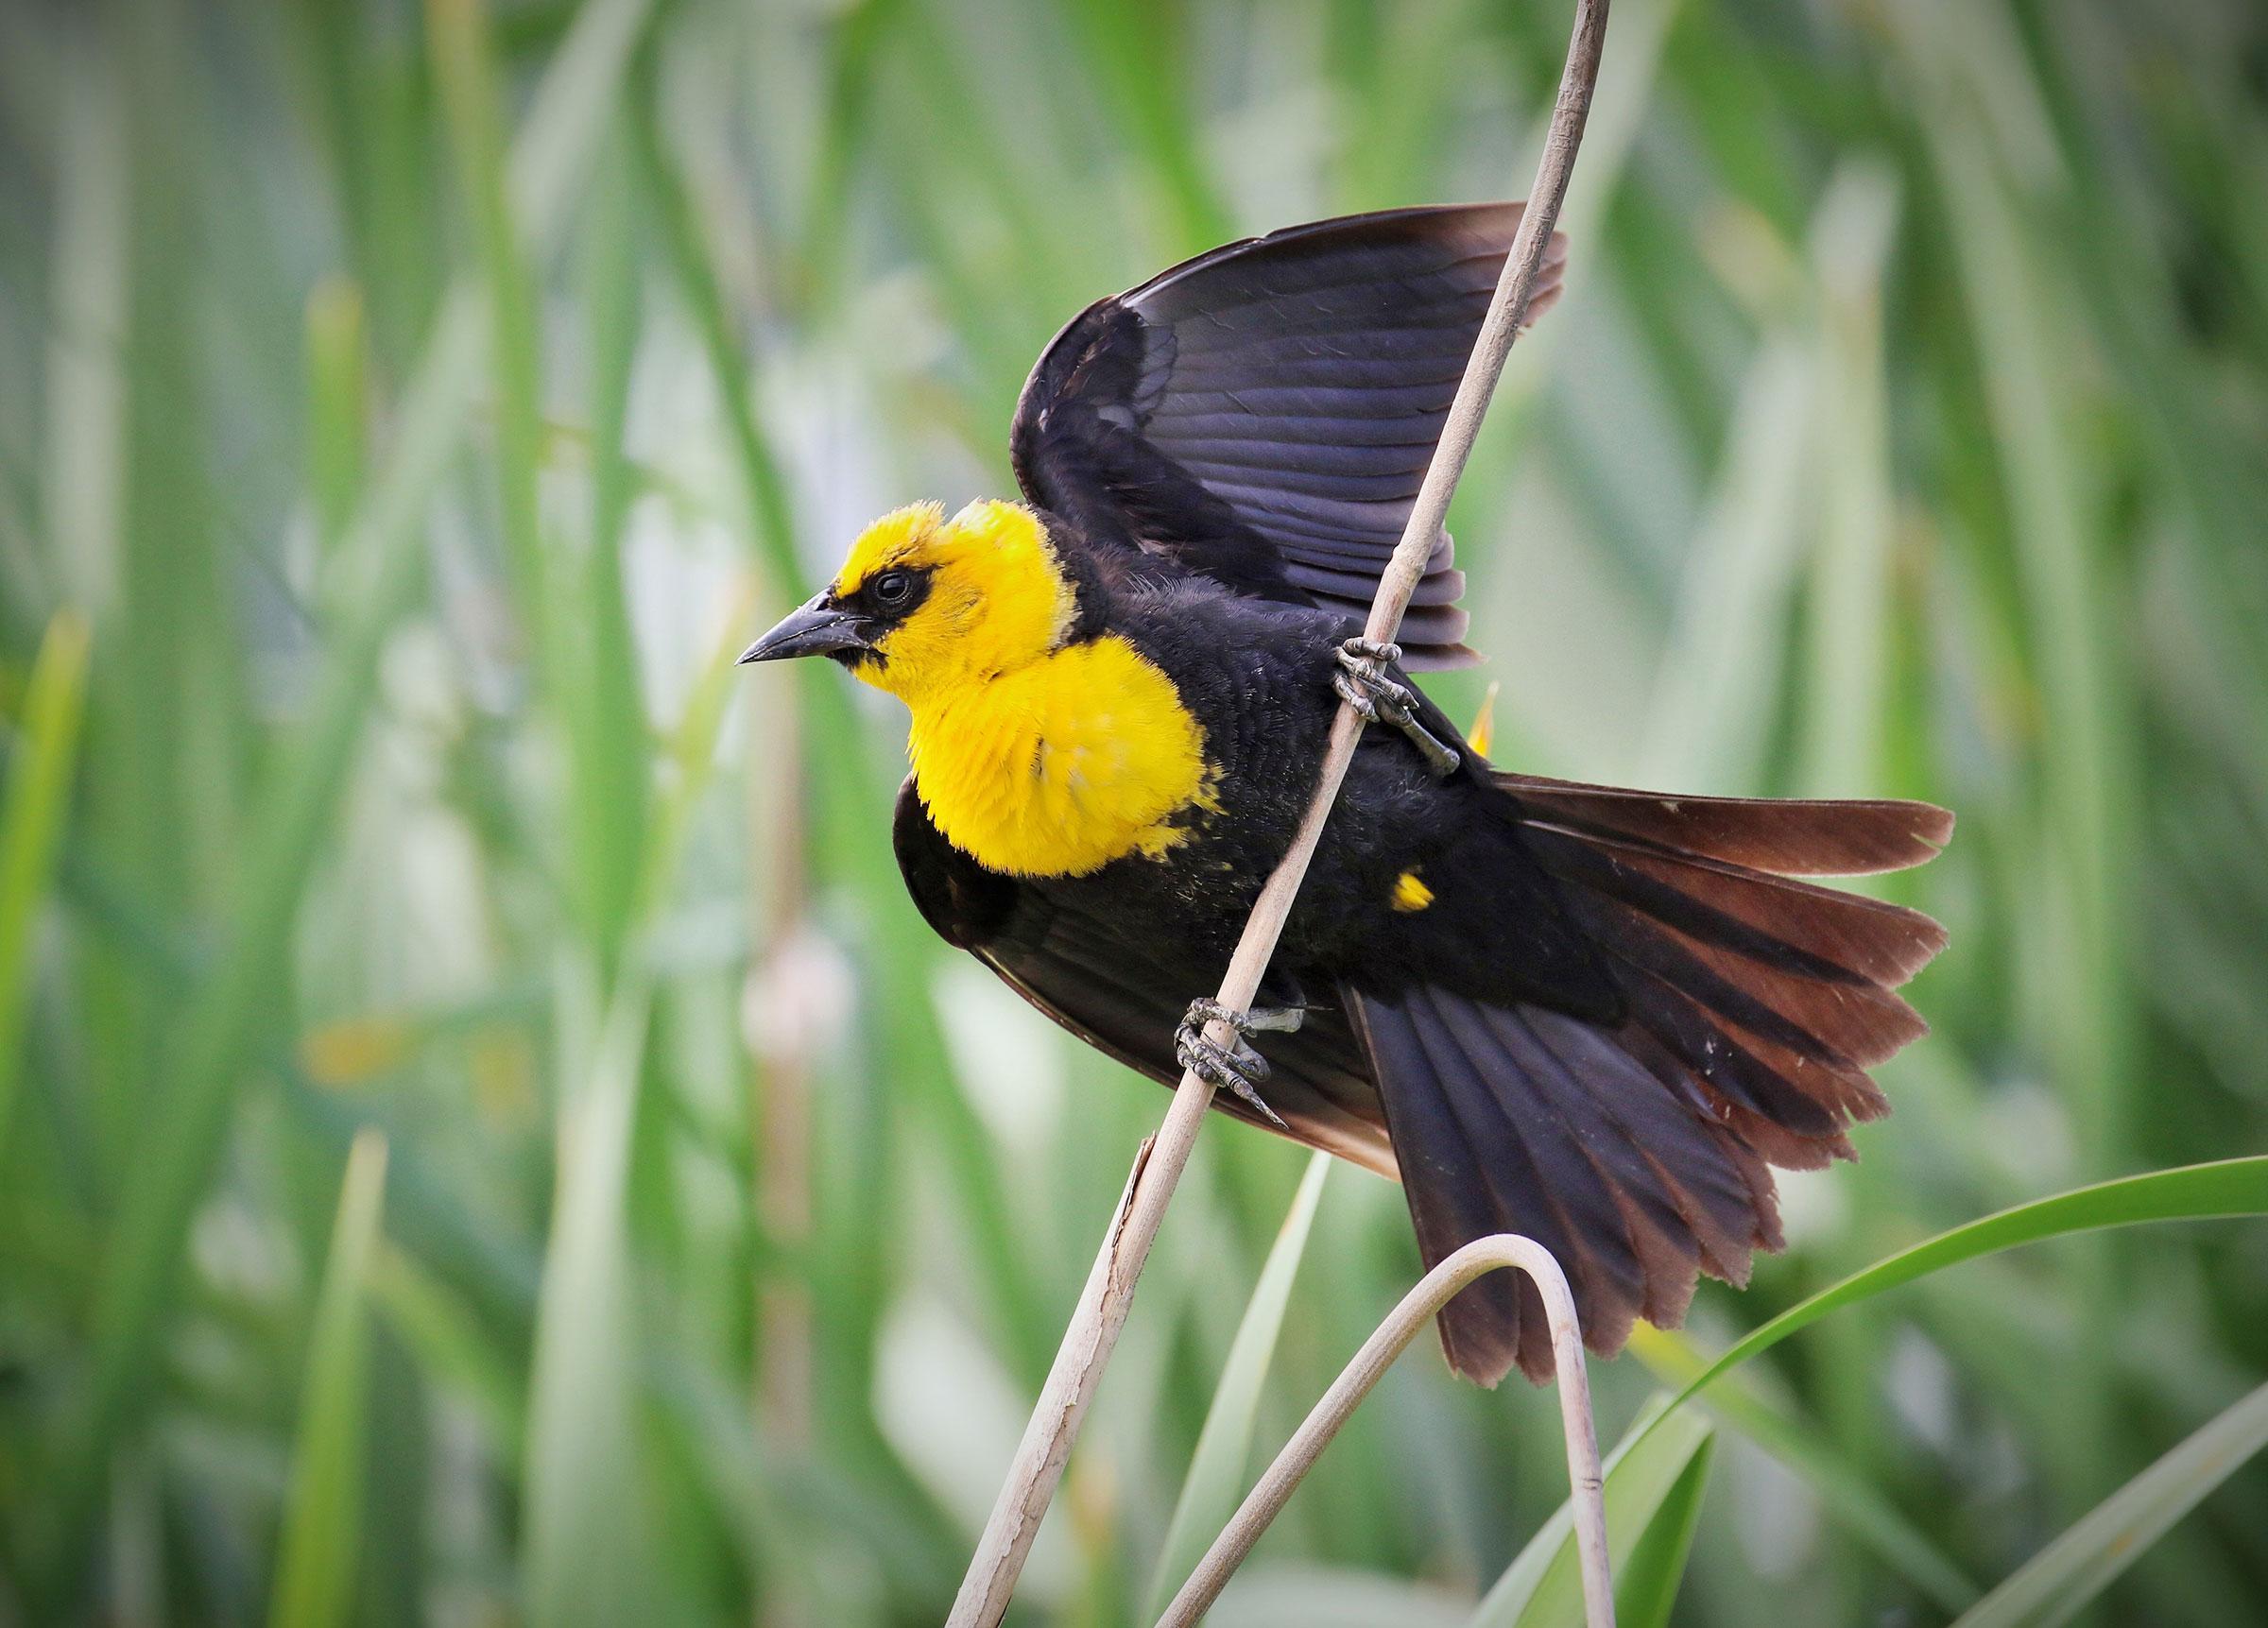 Hear the raucous calls of territorial Yellow-headed Blackbirds at Minnesota's Festival of Birds. Charles Wheeler/Audubon Photography Awards